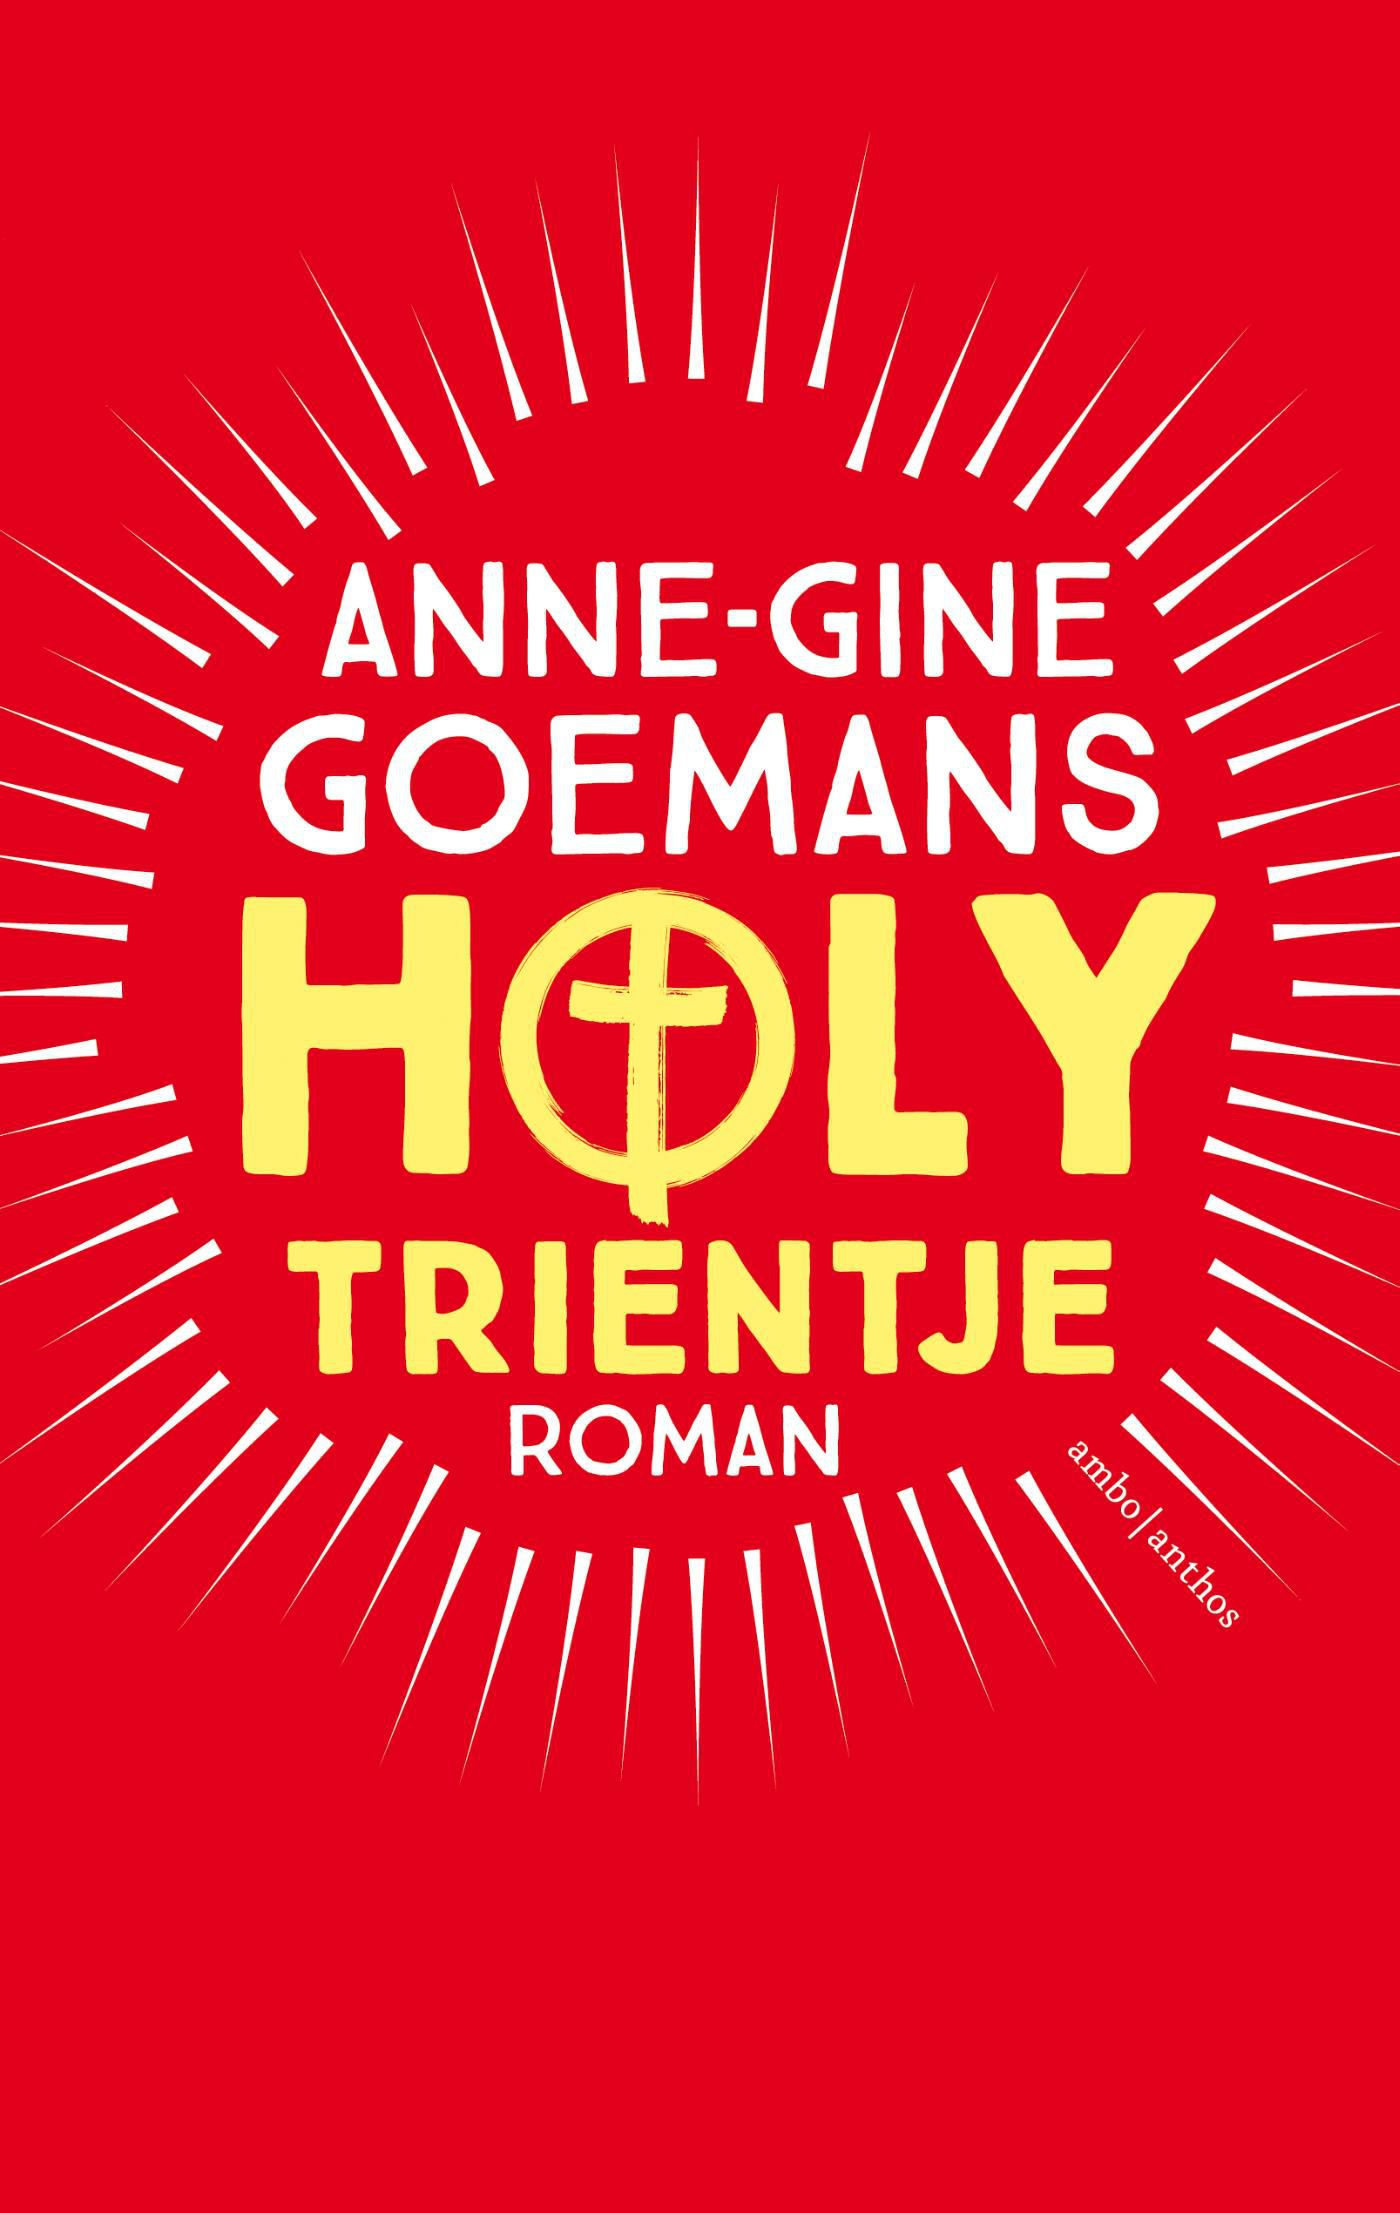 Anne-Ginne Goemans - Holy Trientje